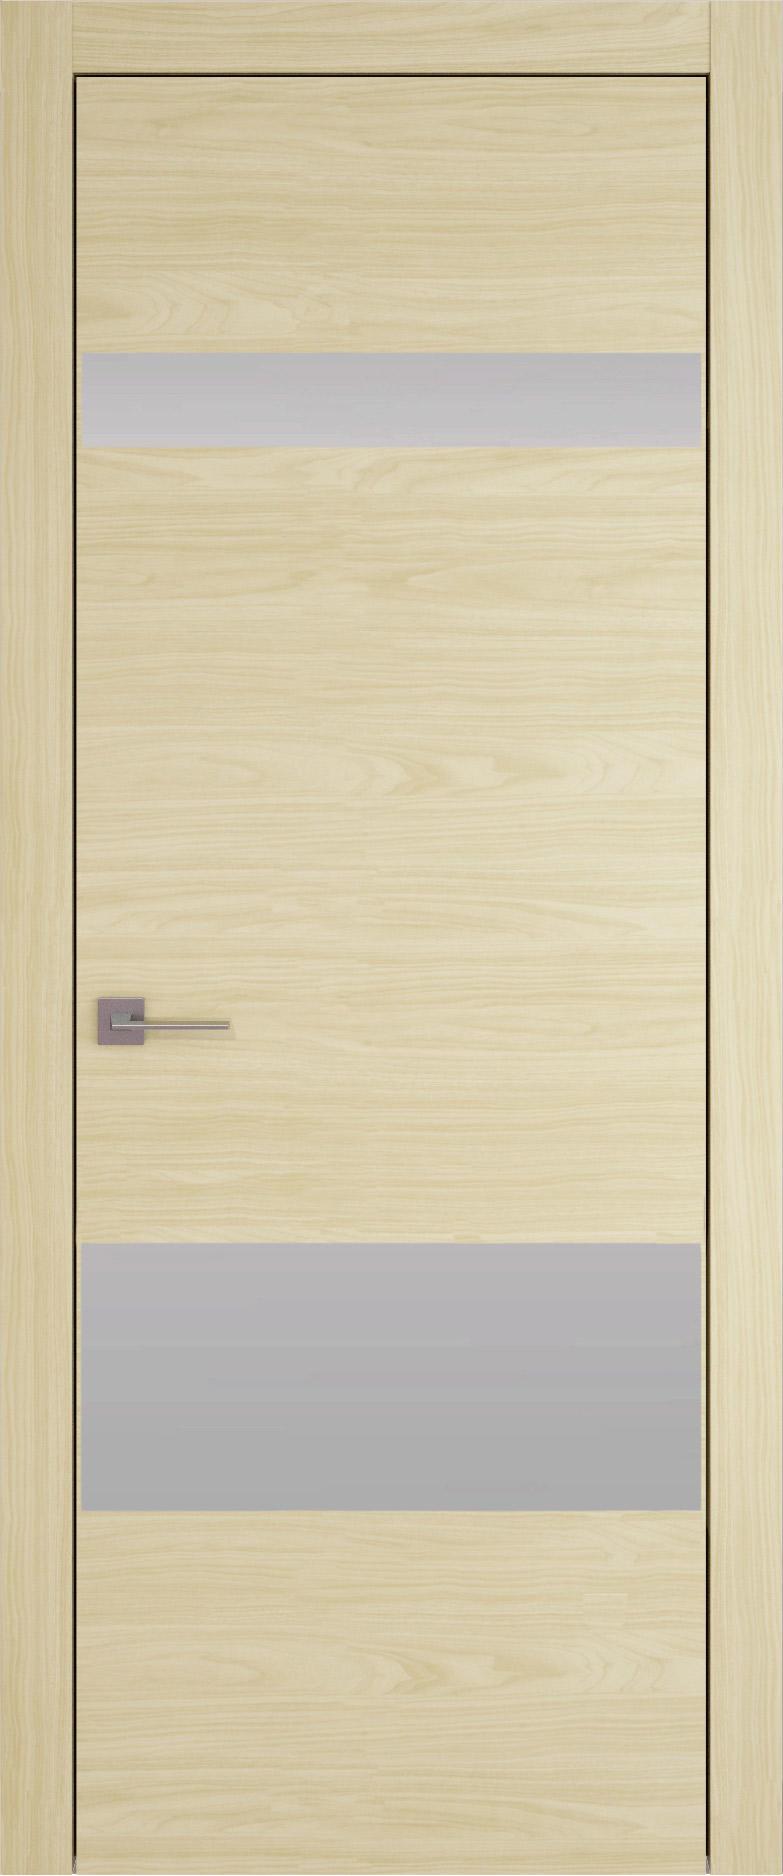 Tivoli К-4 цвет - Дуб нордик Без стекла (ДГ)